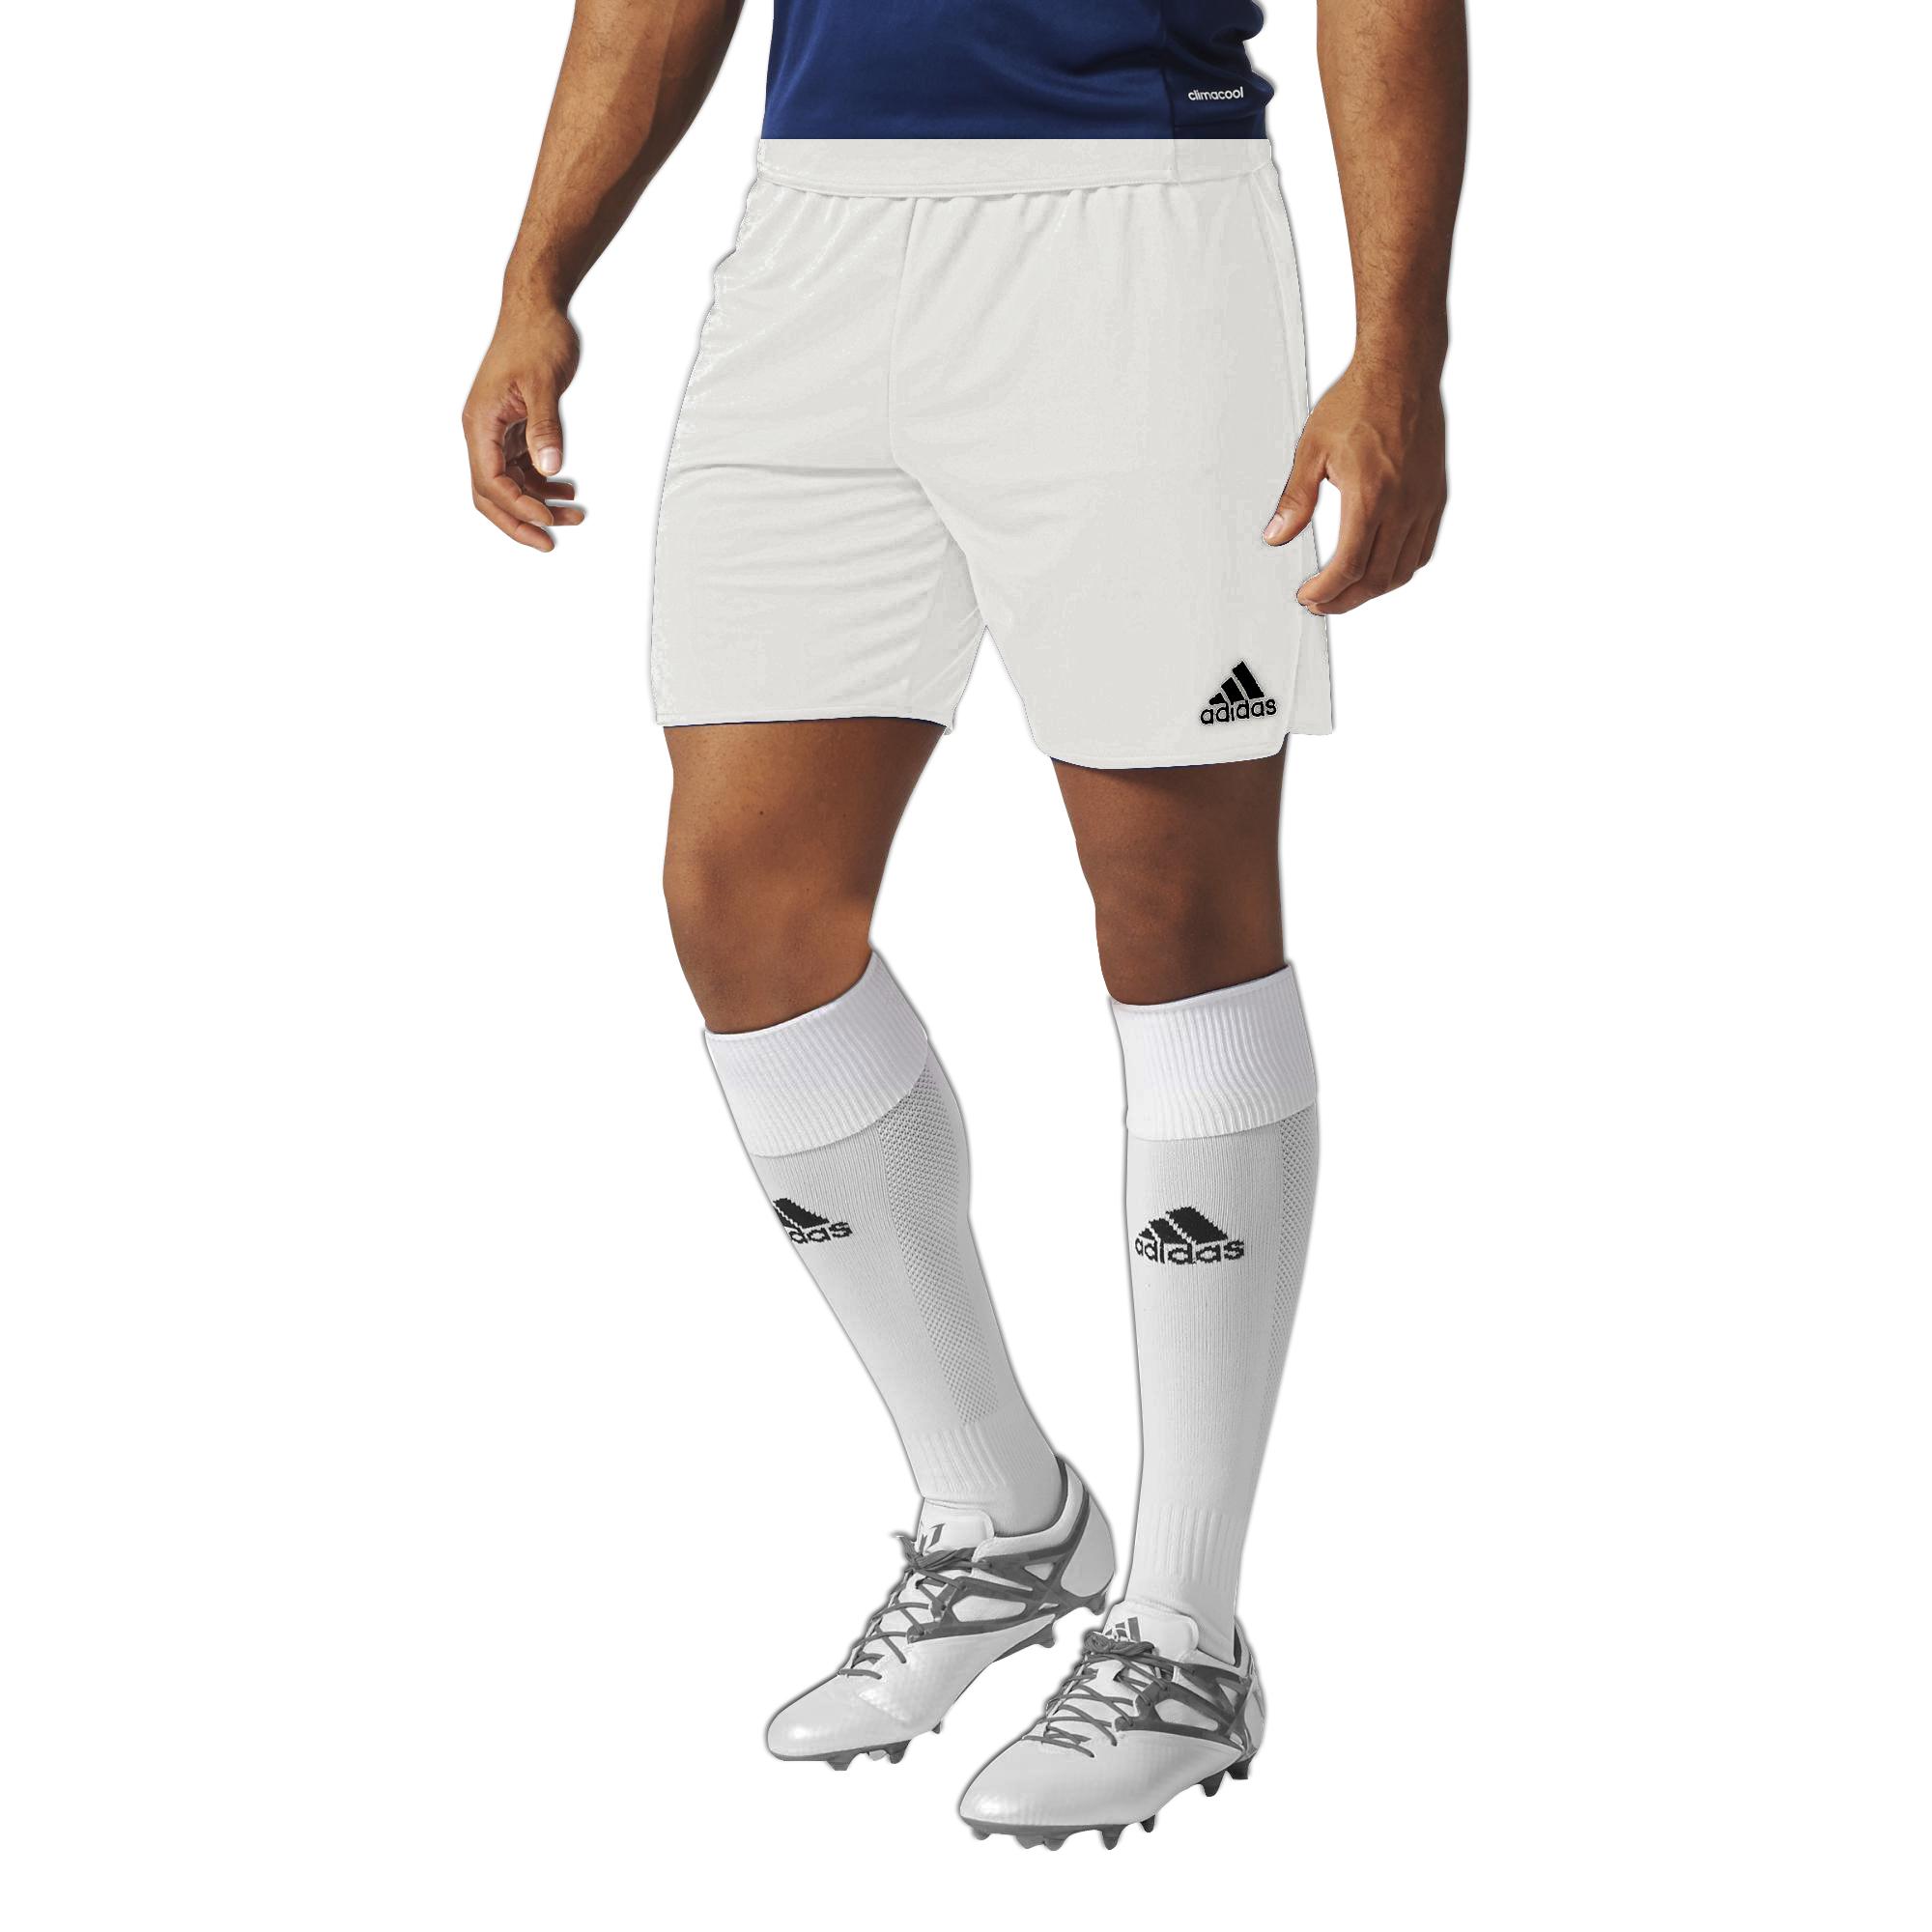 adidas-Men-039-s-Parma-Football-Training-Team-Wear-Shorts-Sport-Casual-Gym-B-Grade thumbnail 14